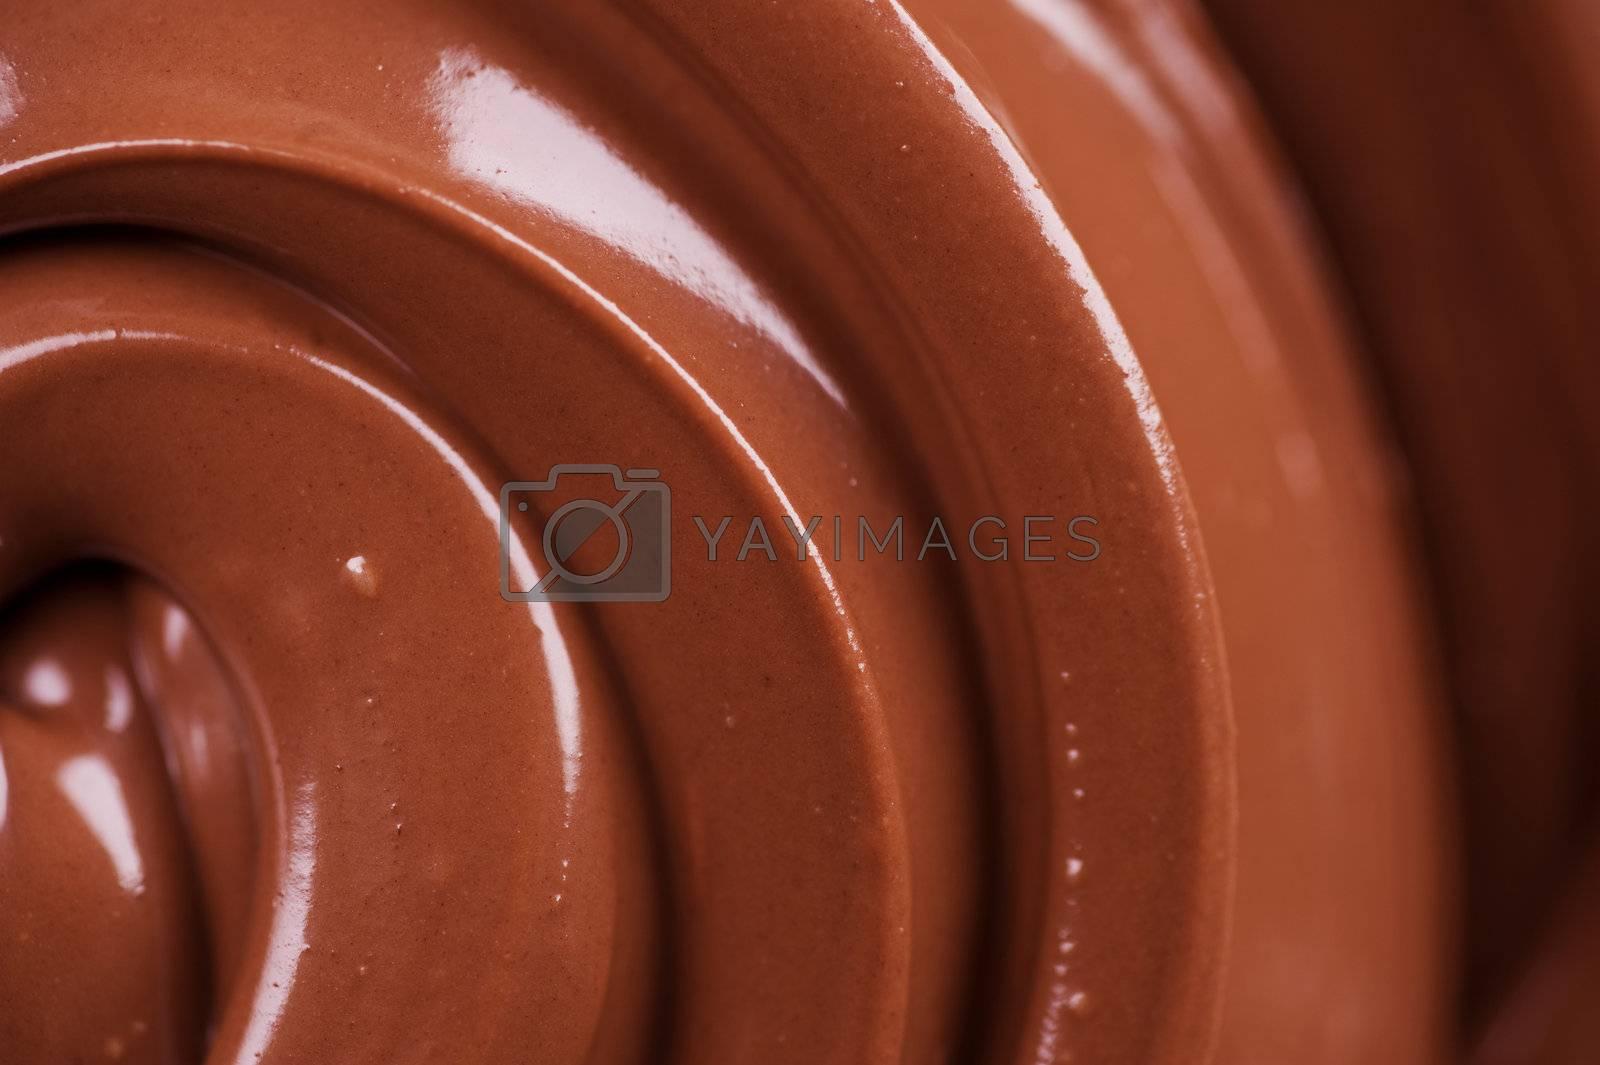 Chocolate backgroud by Subbotina Anna